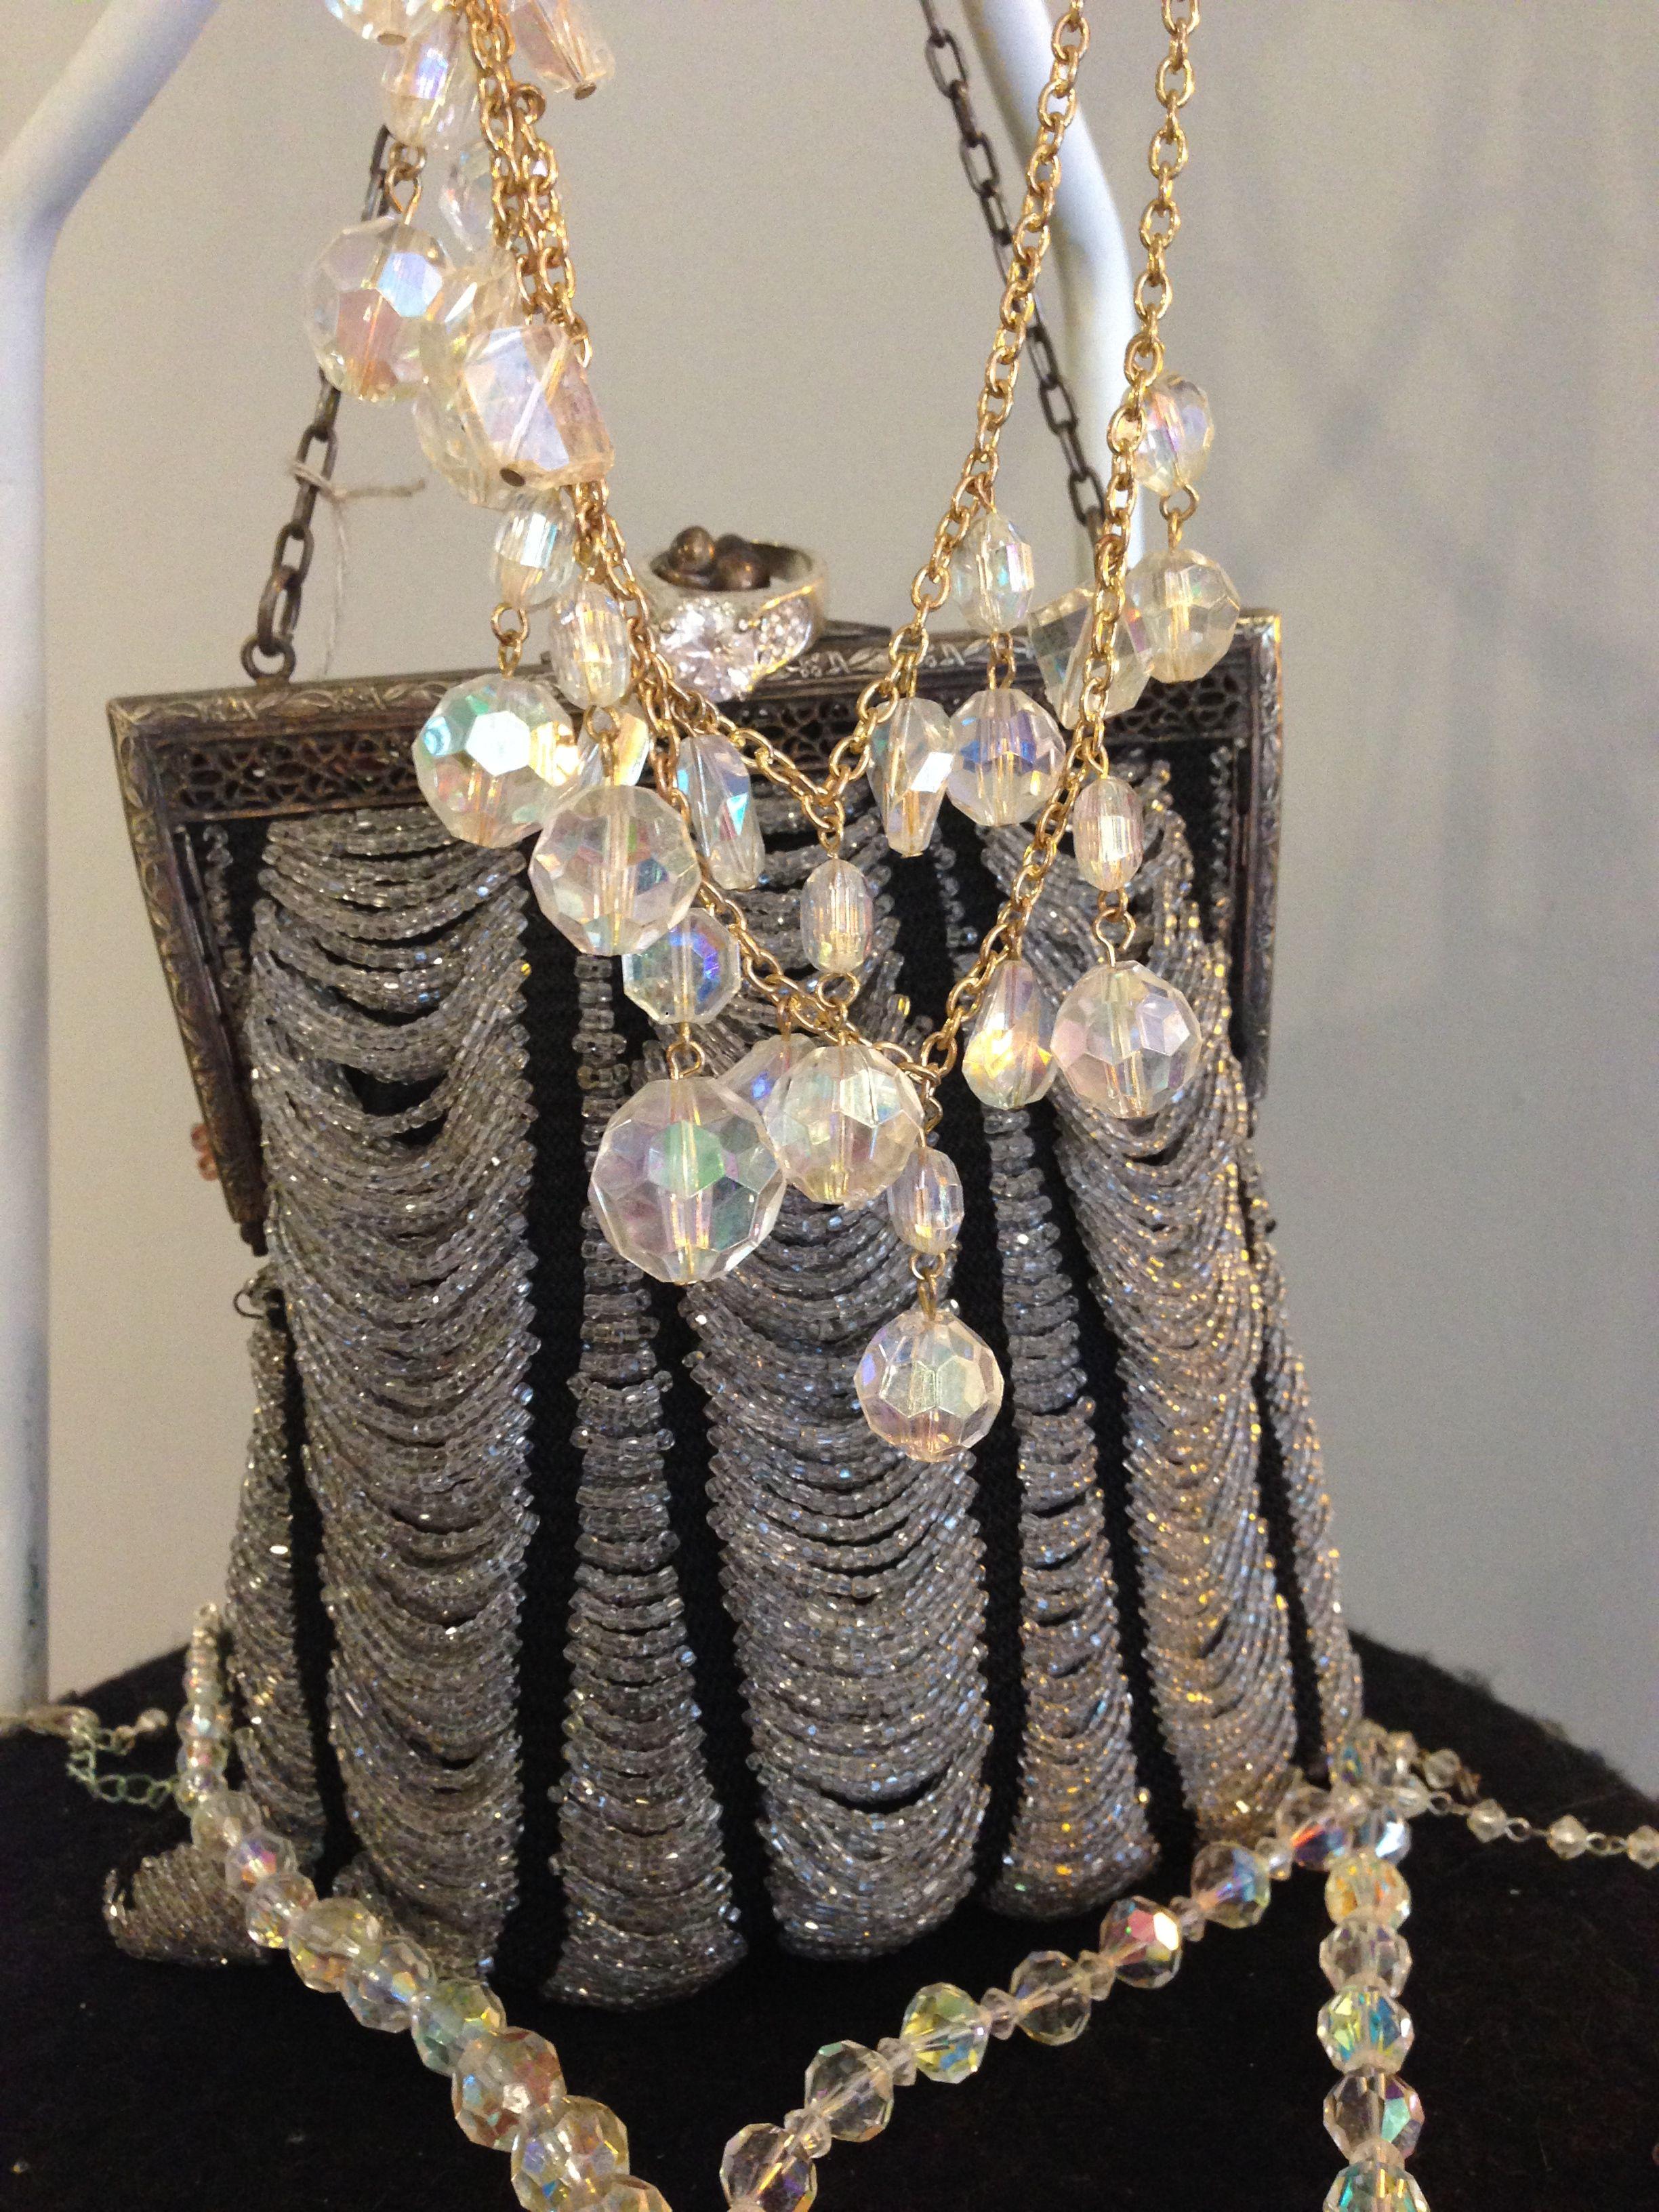 Beautiful accessories